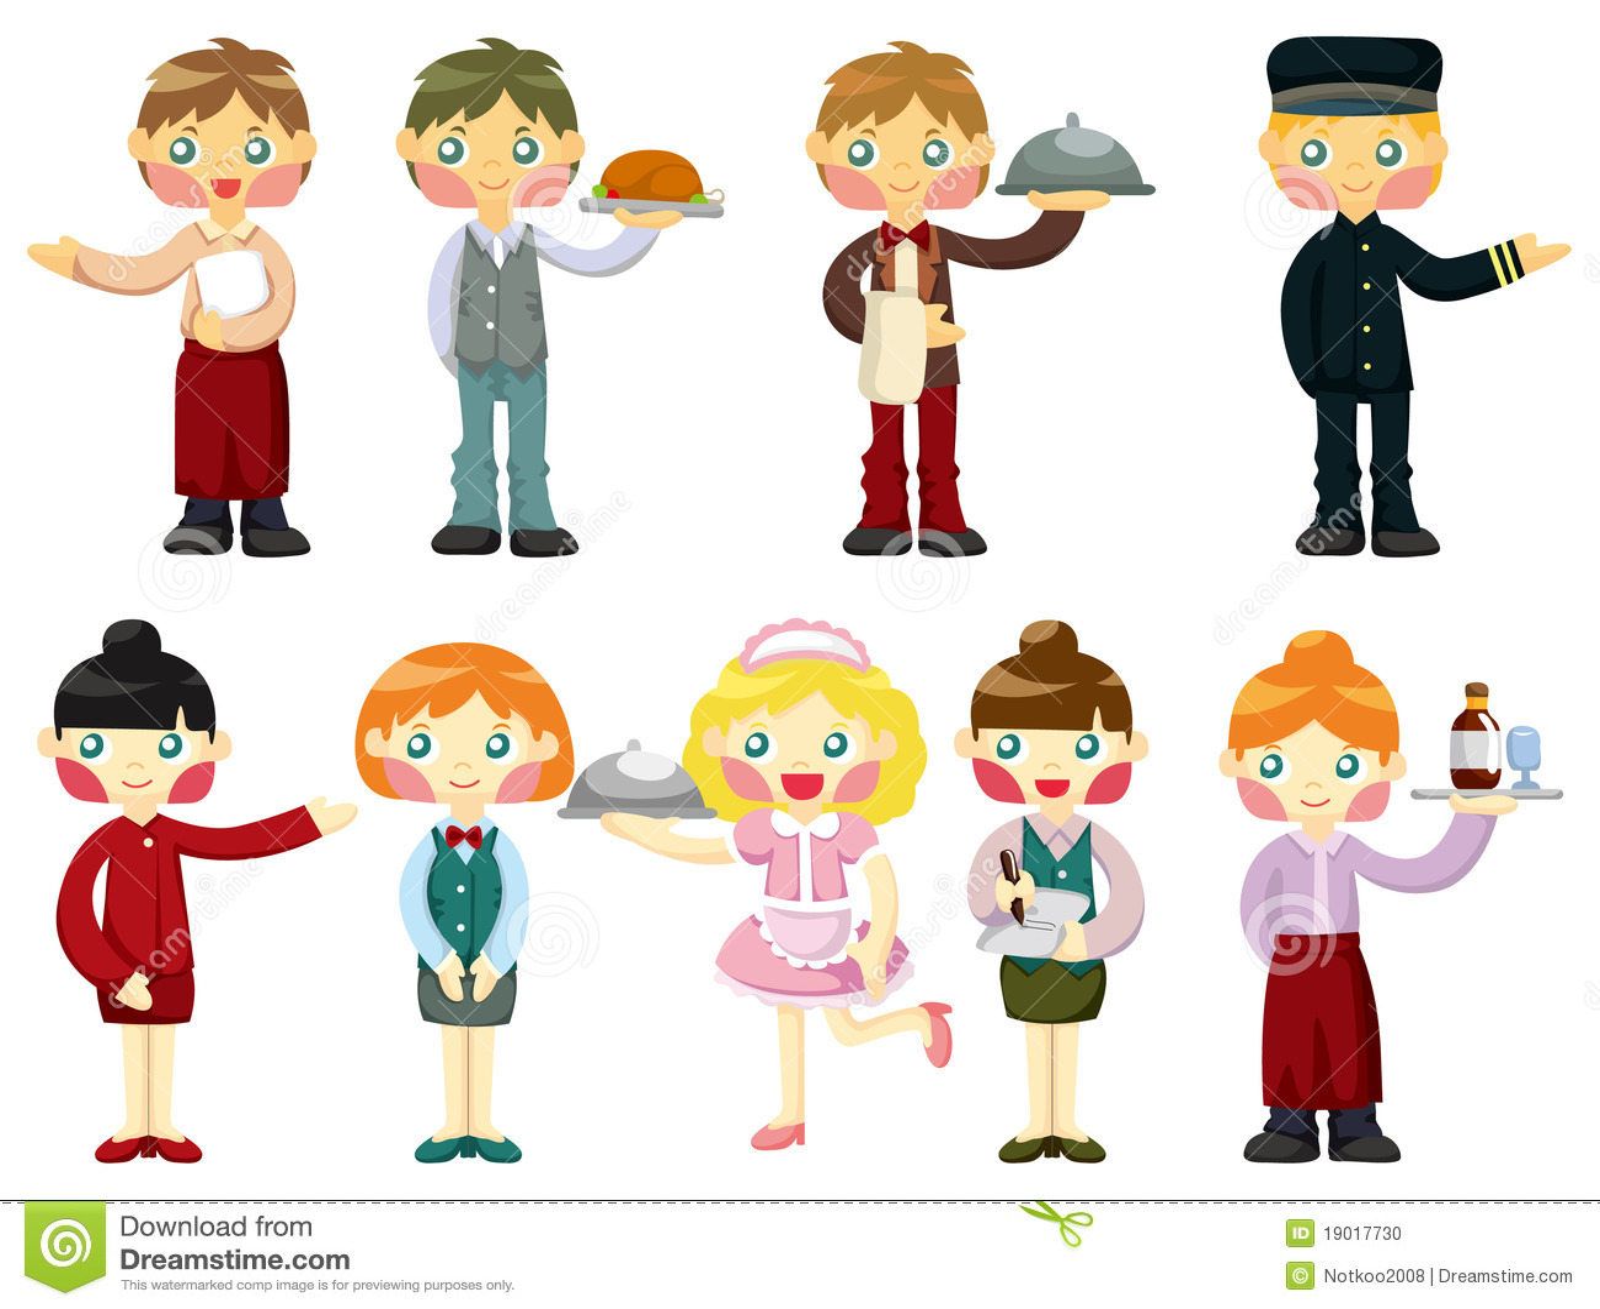 Cartoon waiter and waitress  Waiters And Waitresses Clipart